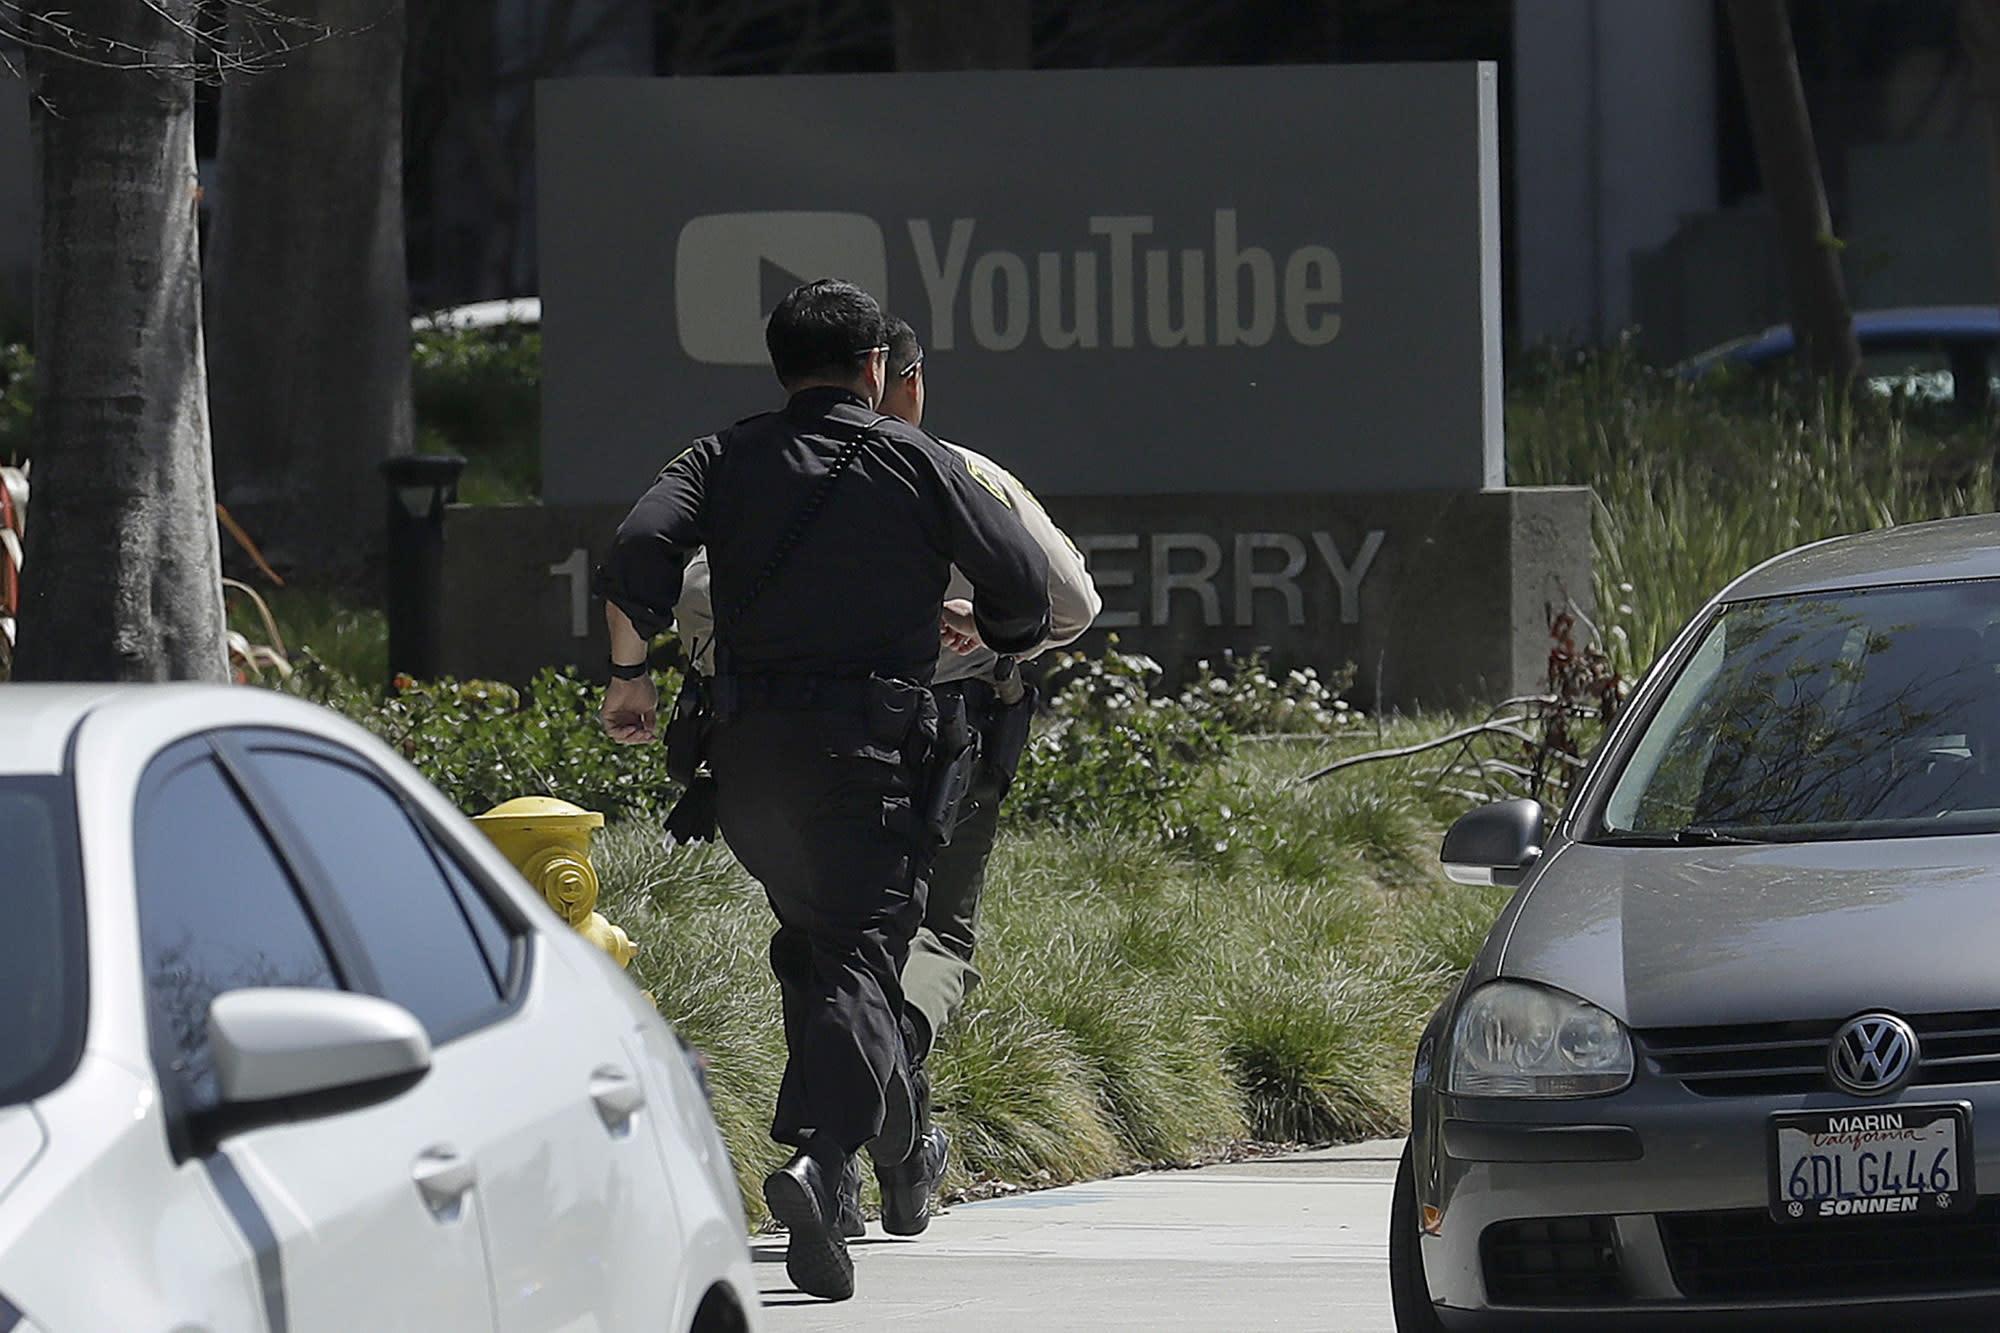 <p>Officers run toward a YouTube office in San Bruno, Calif., April 3, 2018. (Photo: Jeff Chiu/AP) </p>